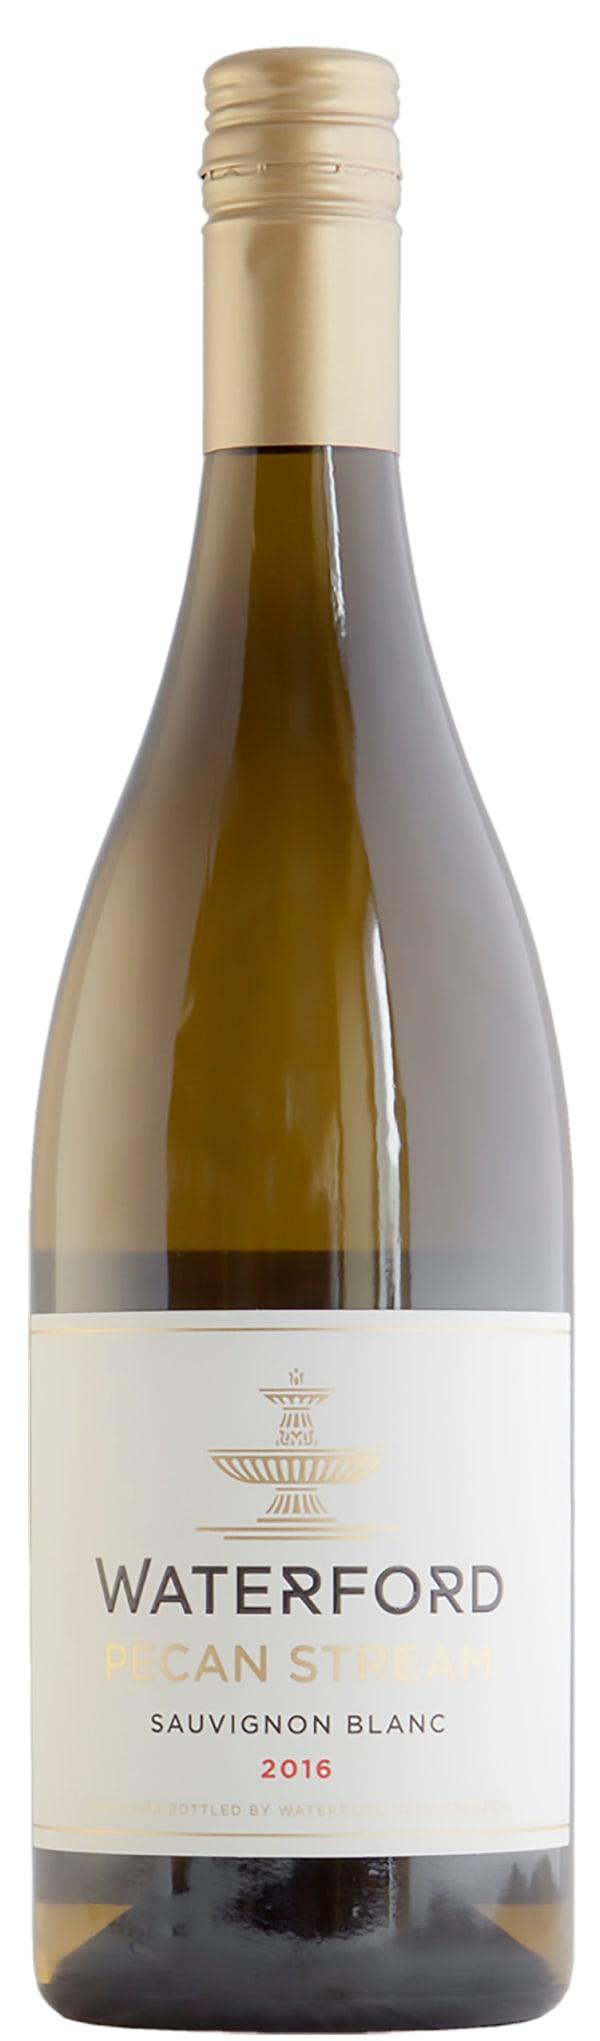 Waterford Pecan Stream Sauvignon Blanc 2017